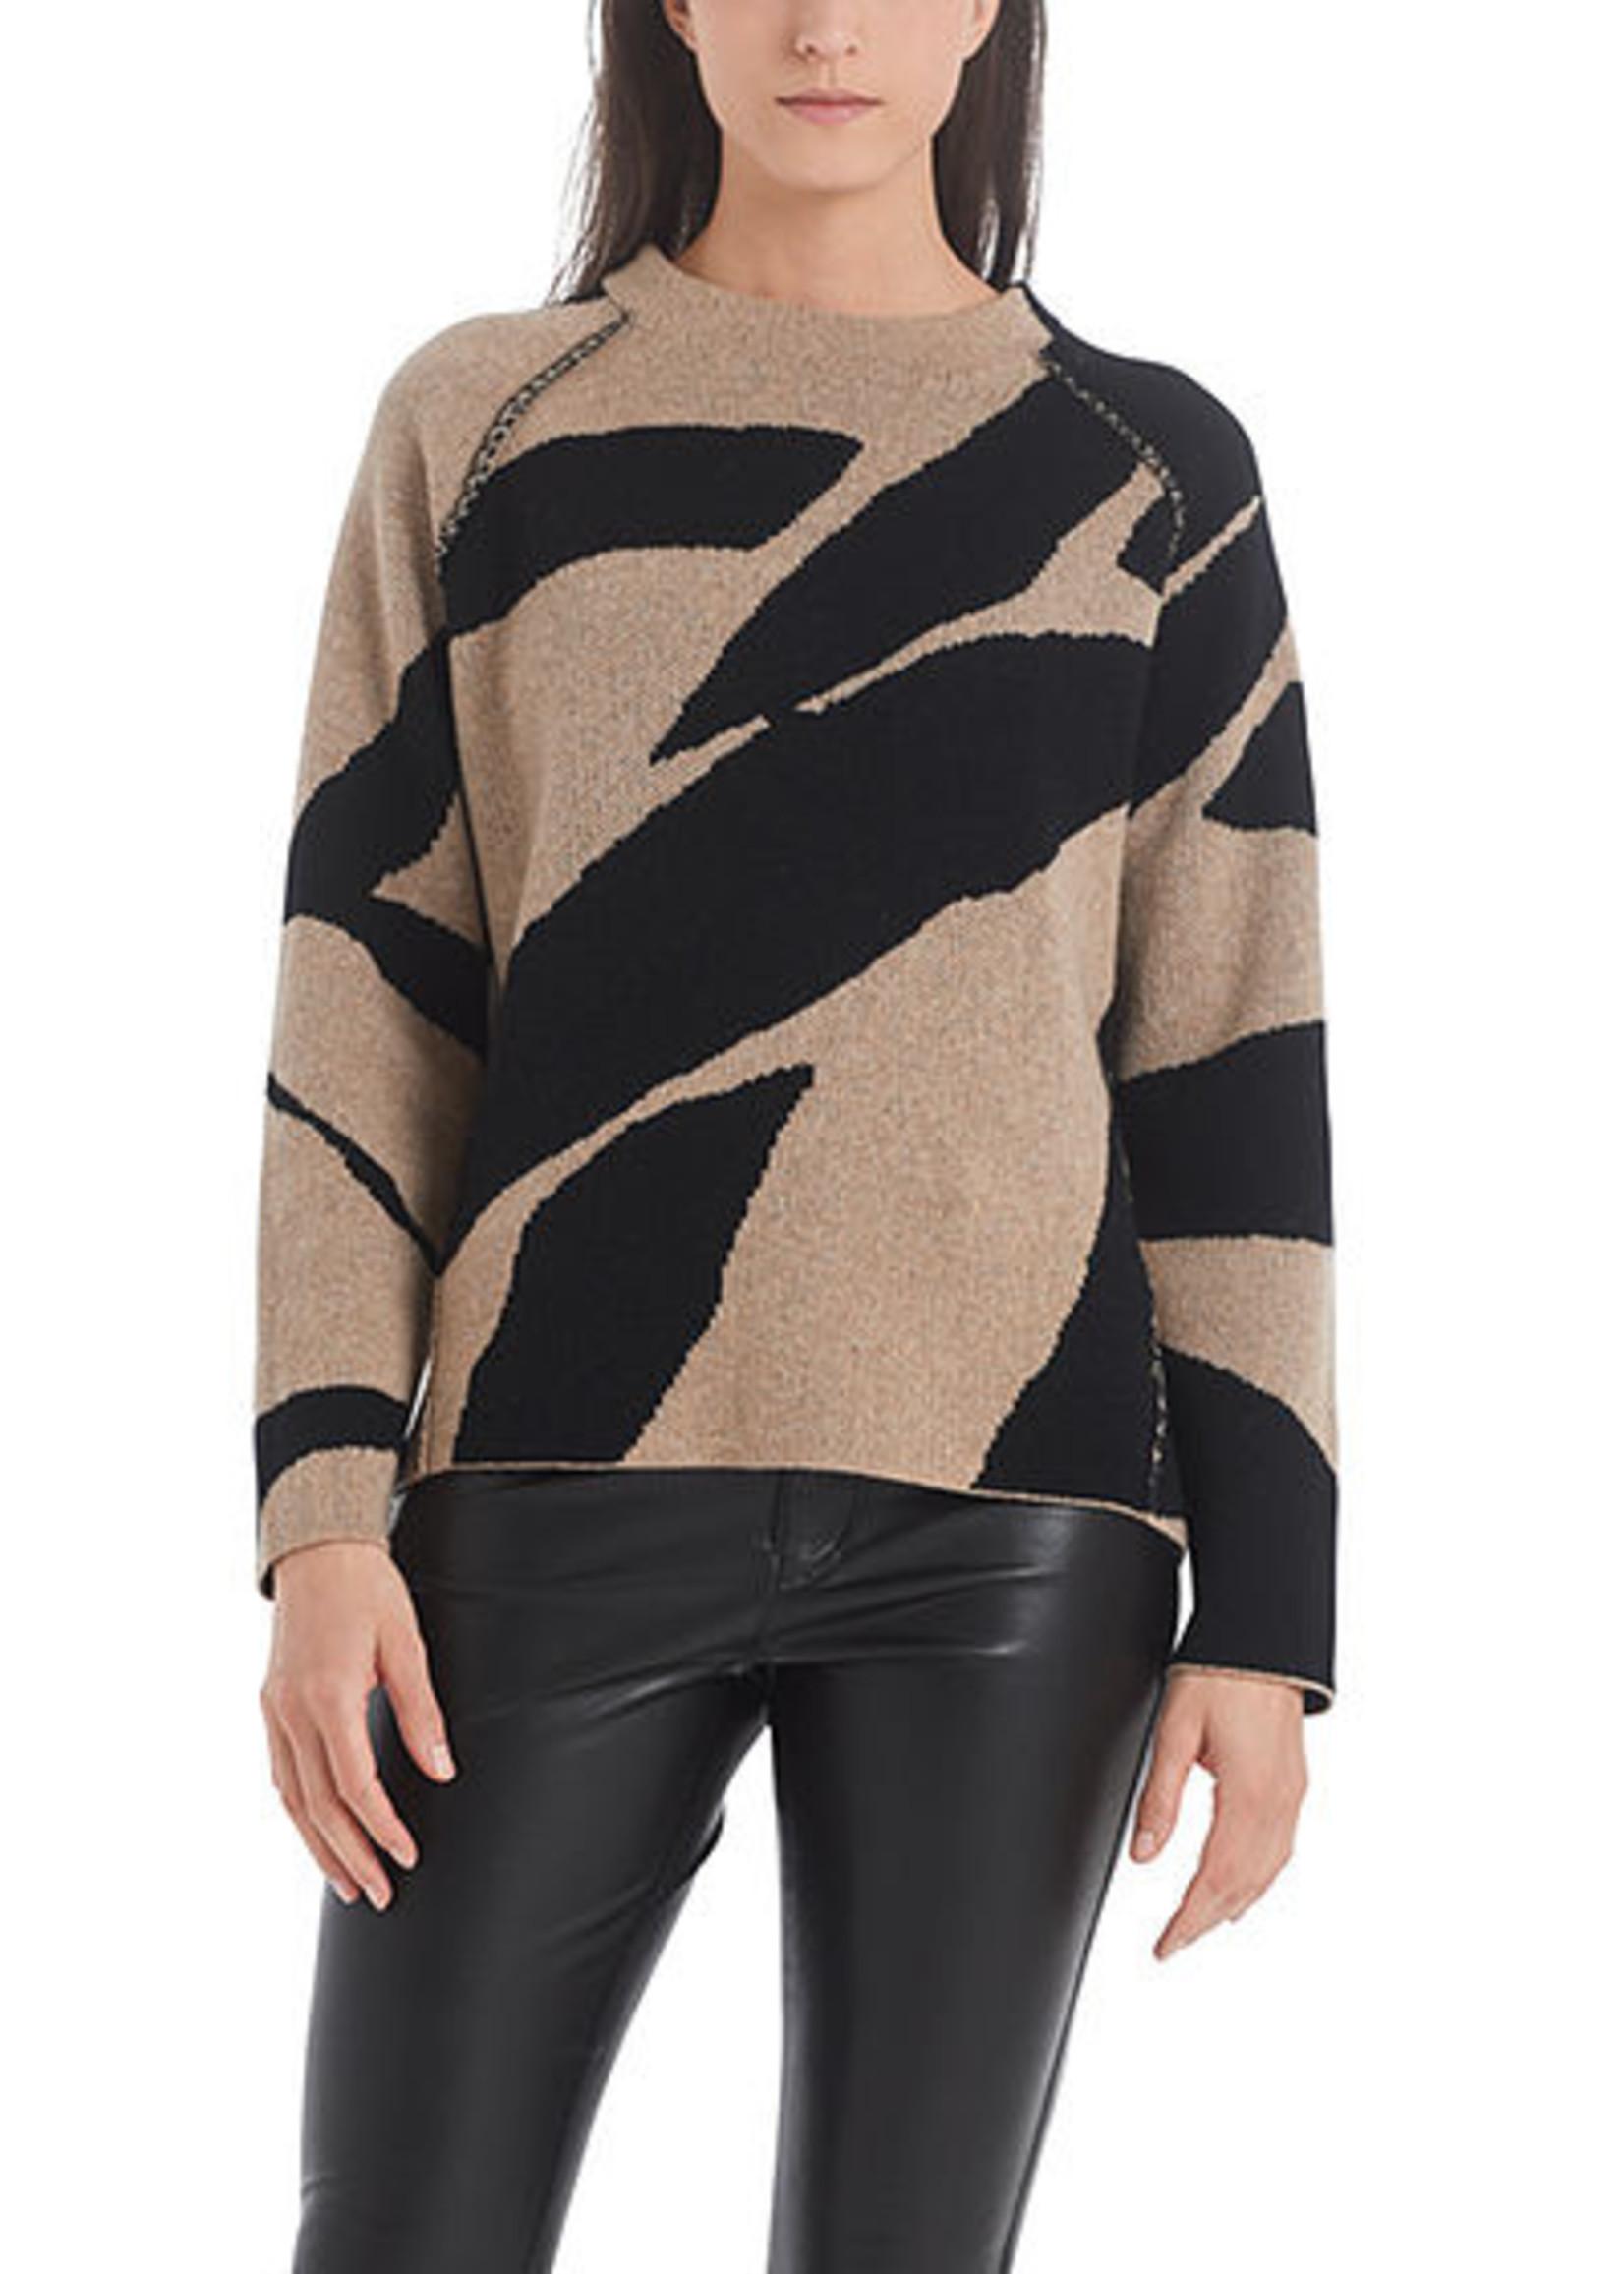 Sweater RC 41.41 M86 caramel